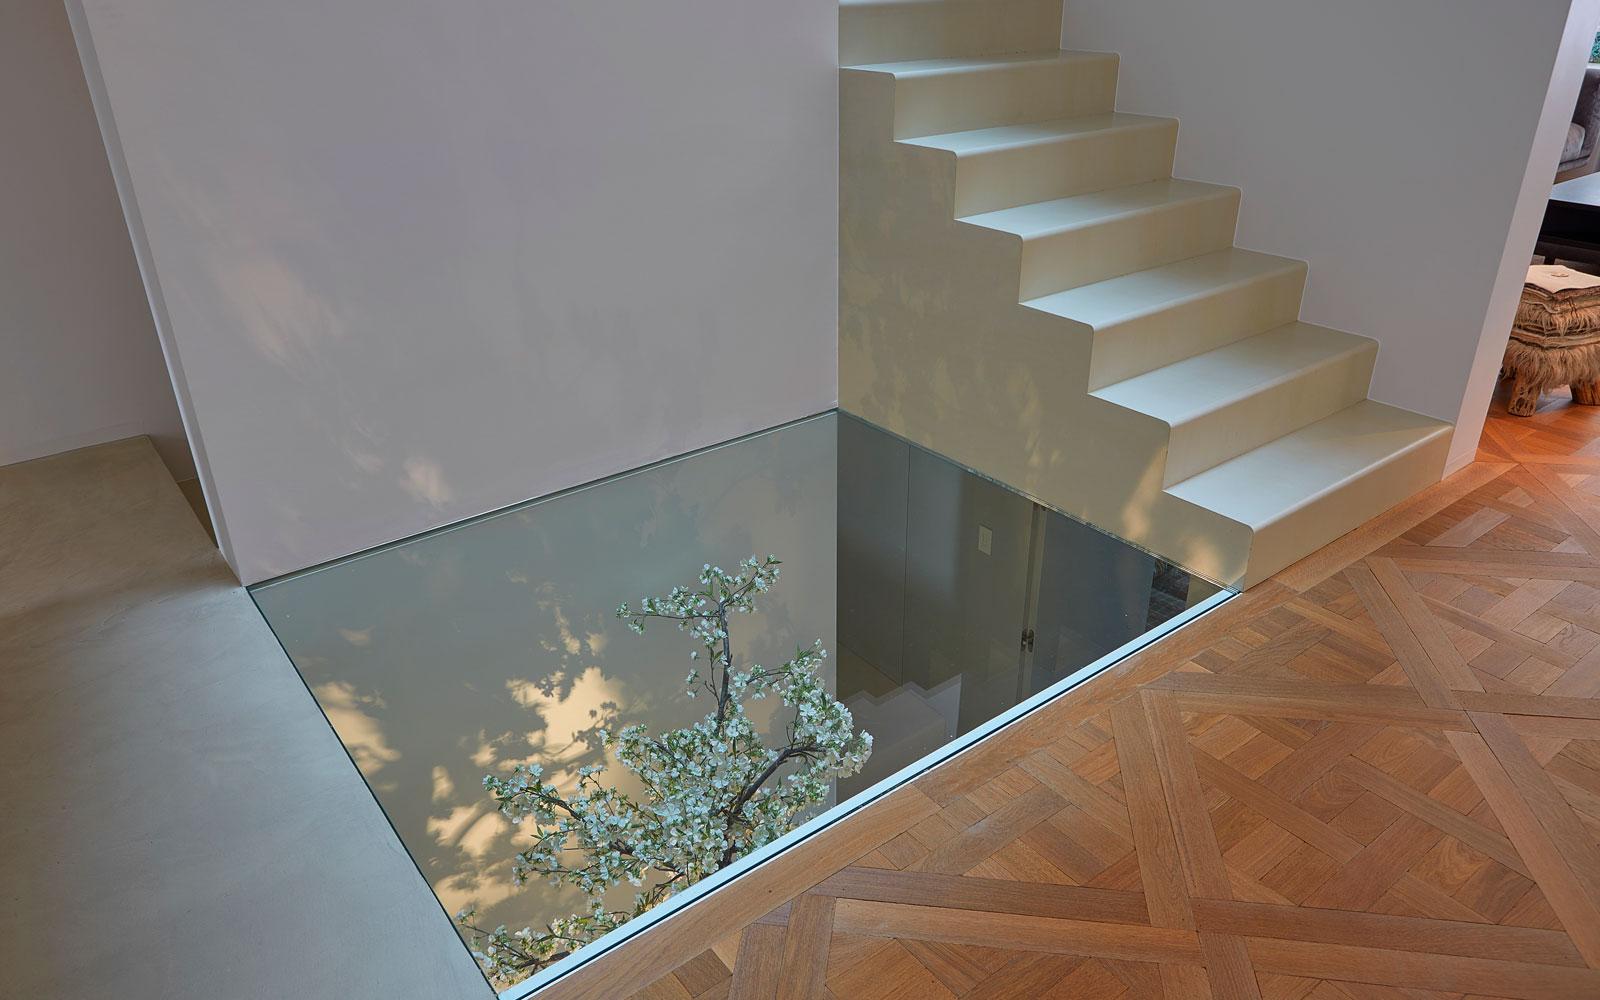 Glazen plafond, licht en ruimte, grachtenpand, Bart van Wijk